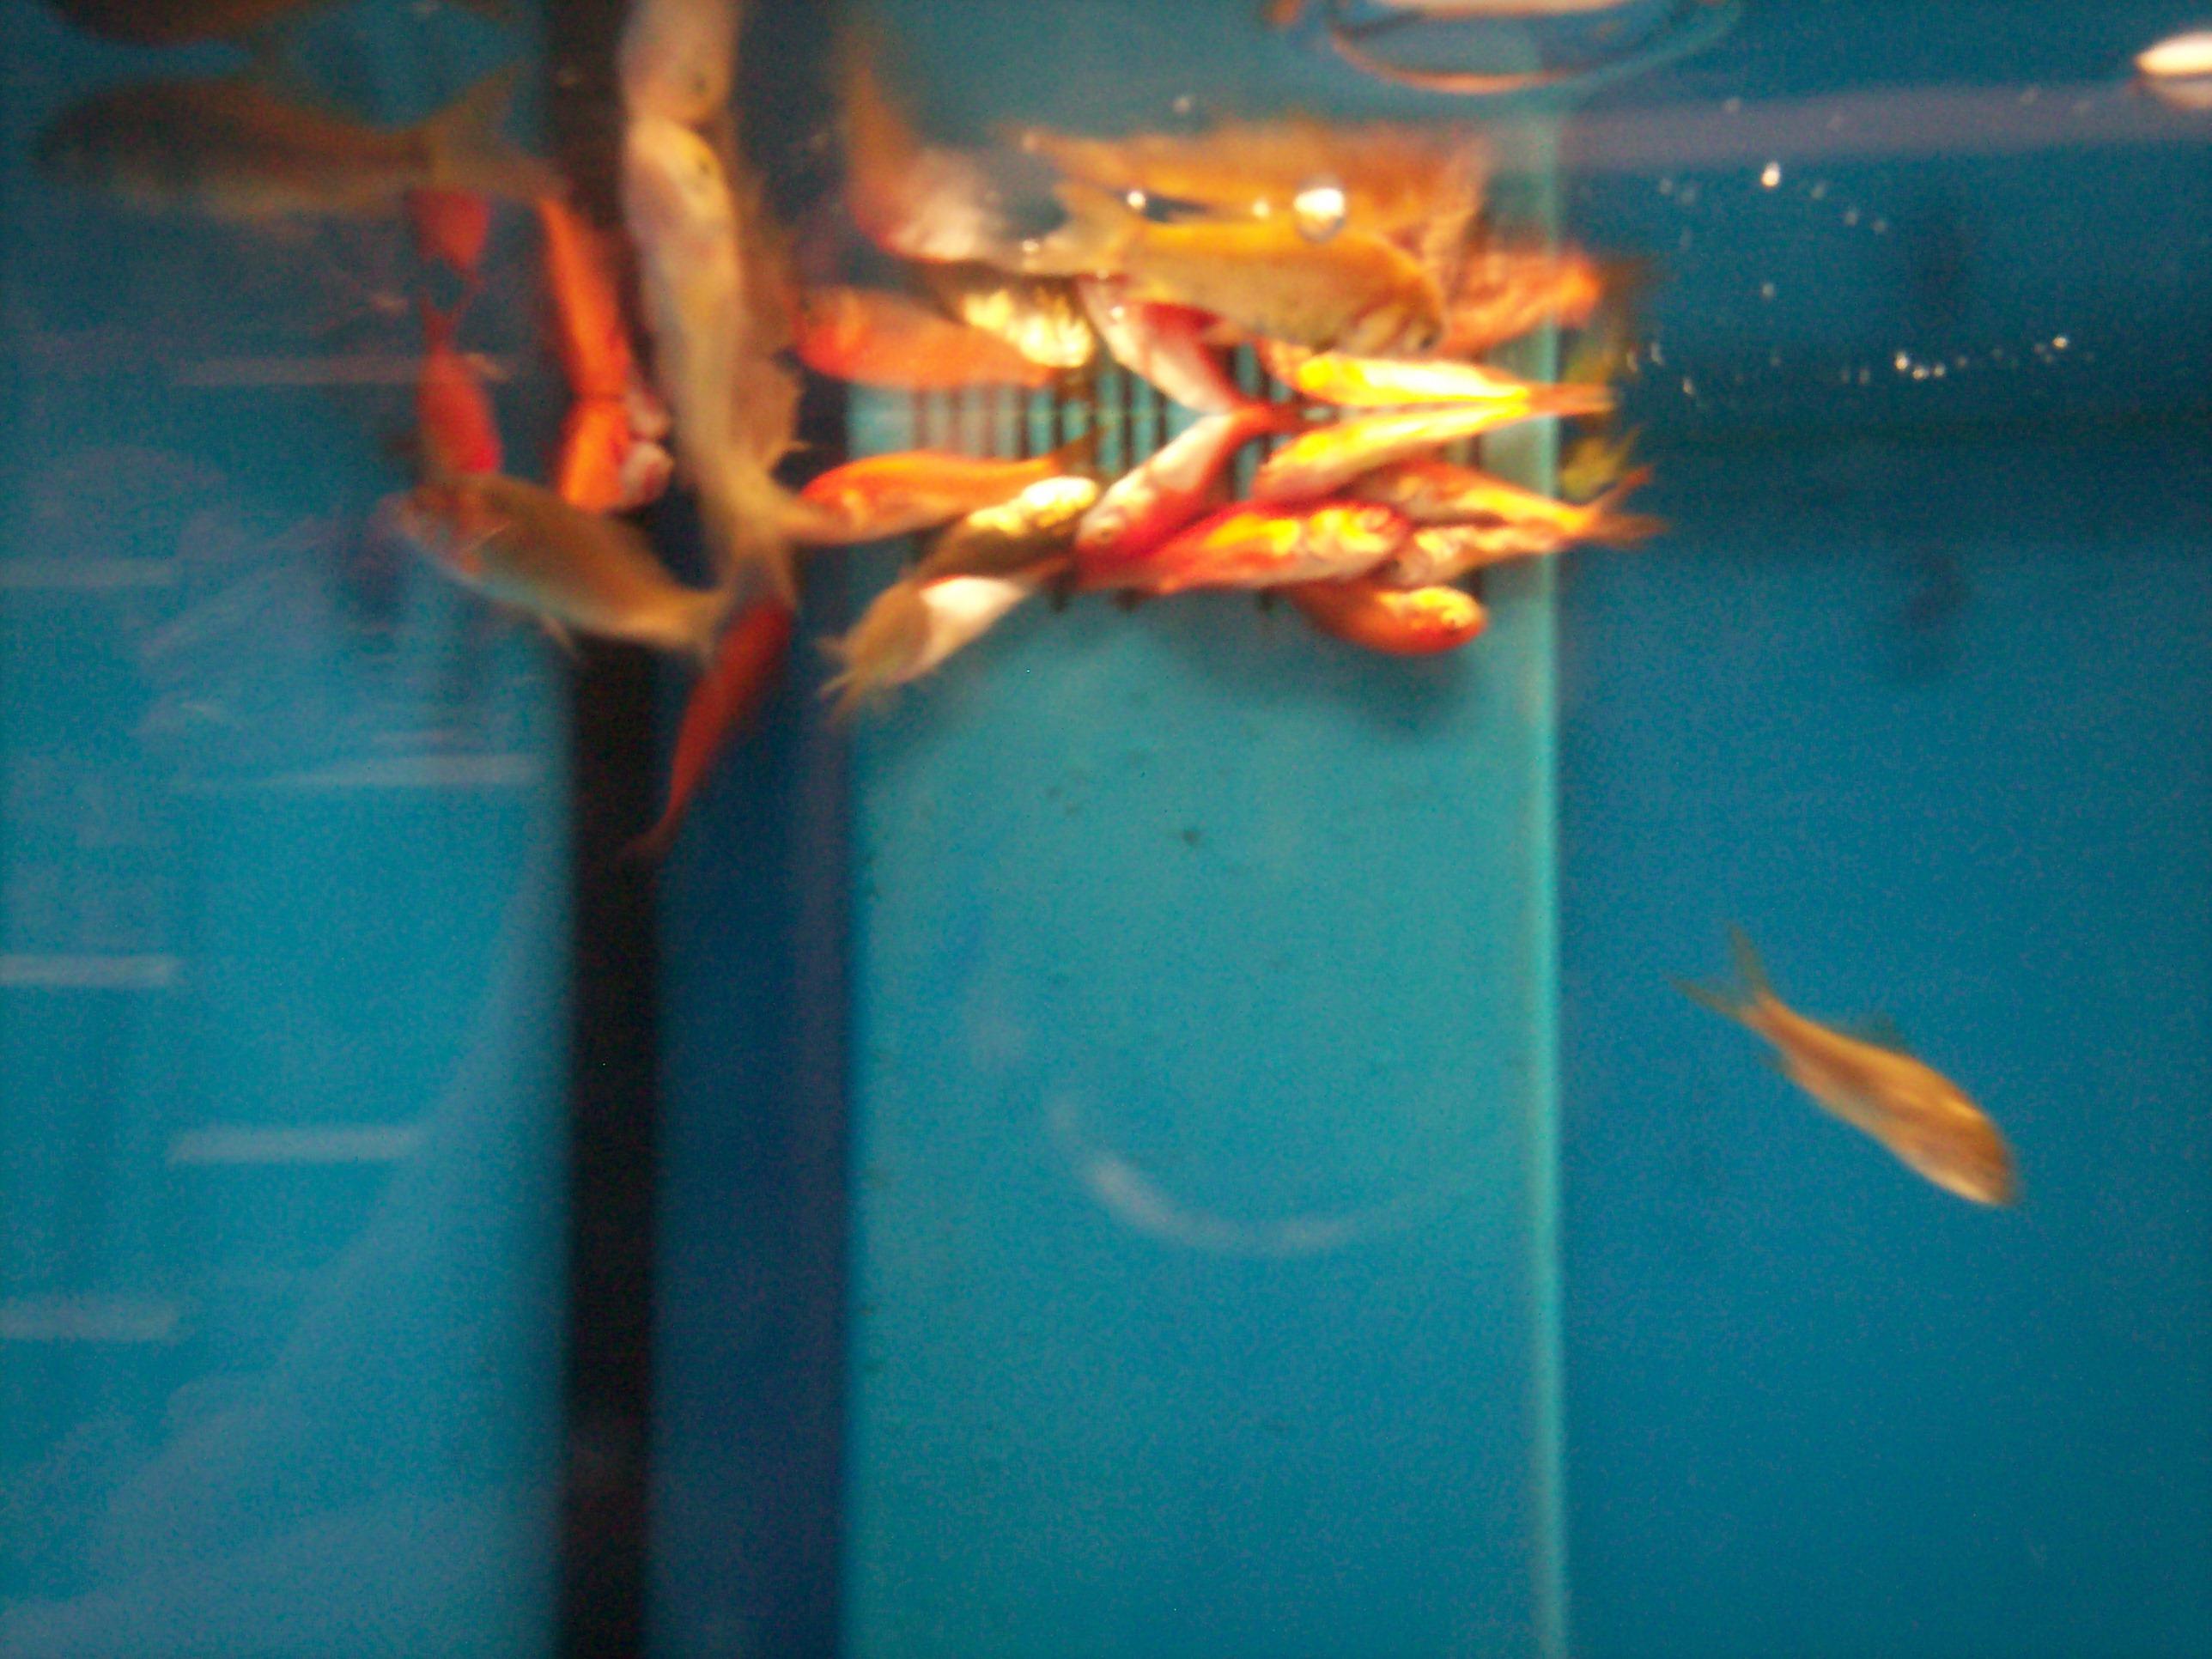 Dead fish at walmart 4 by jamielynneaiken for Fish at walmart